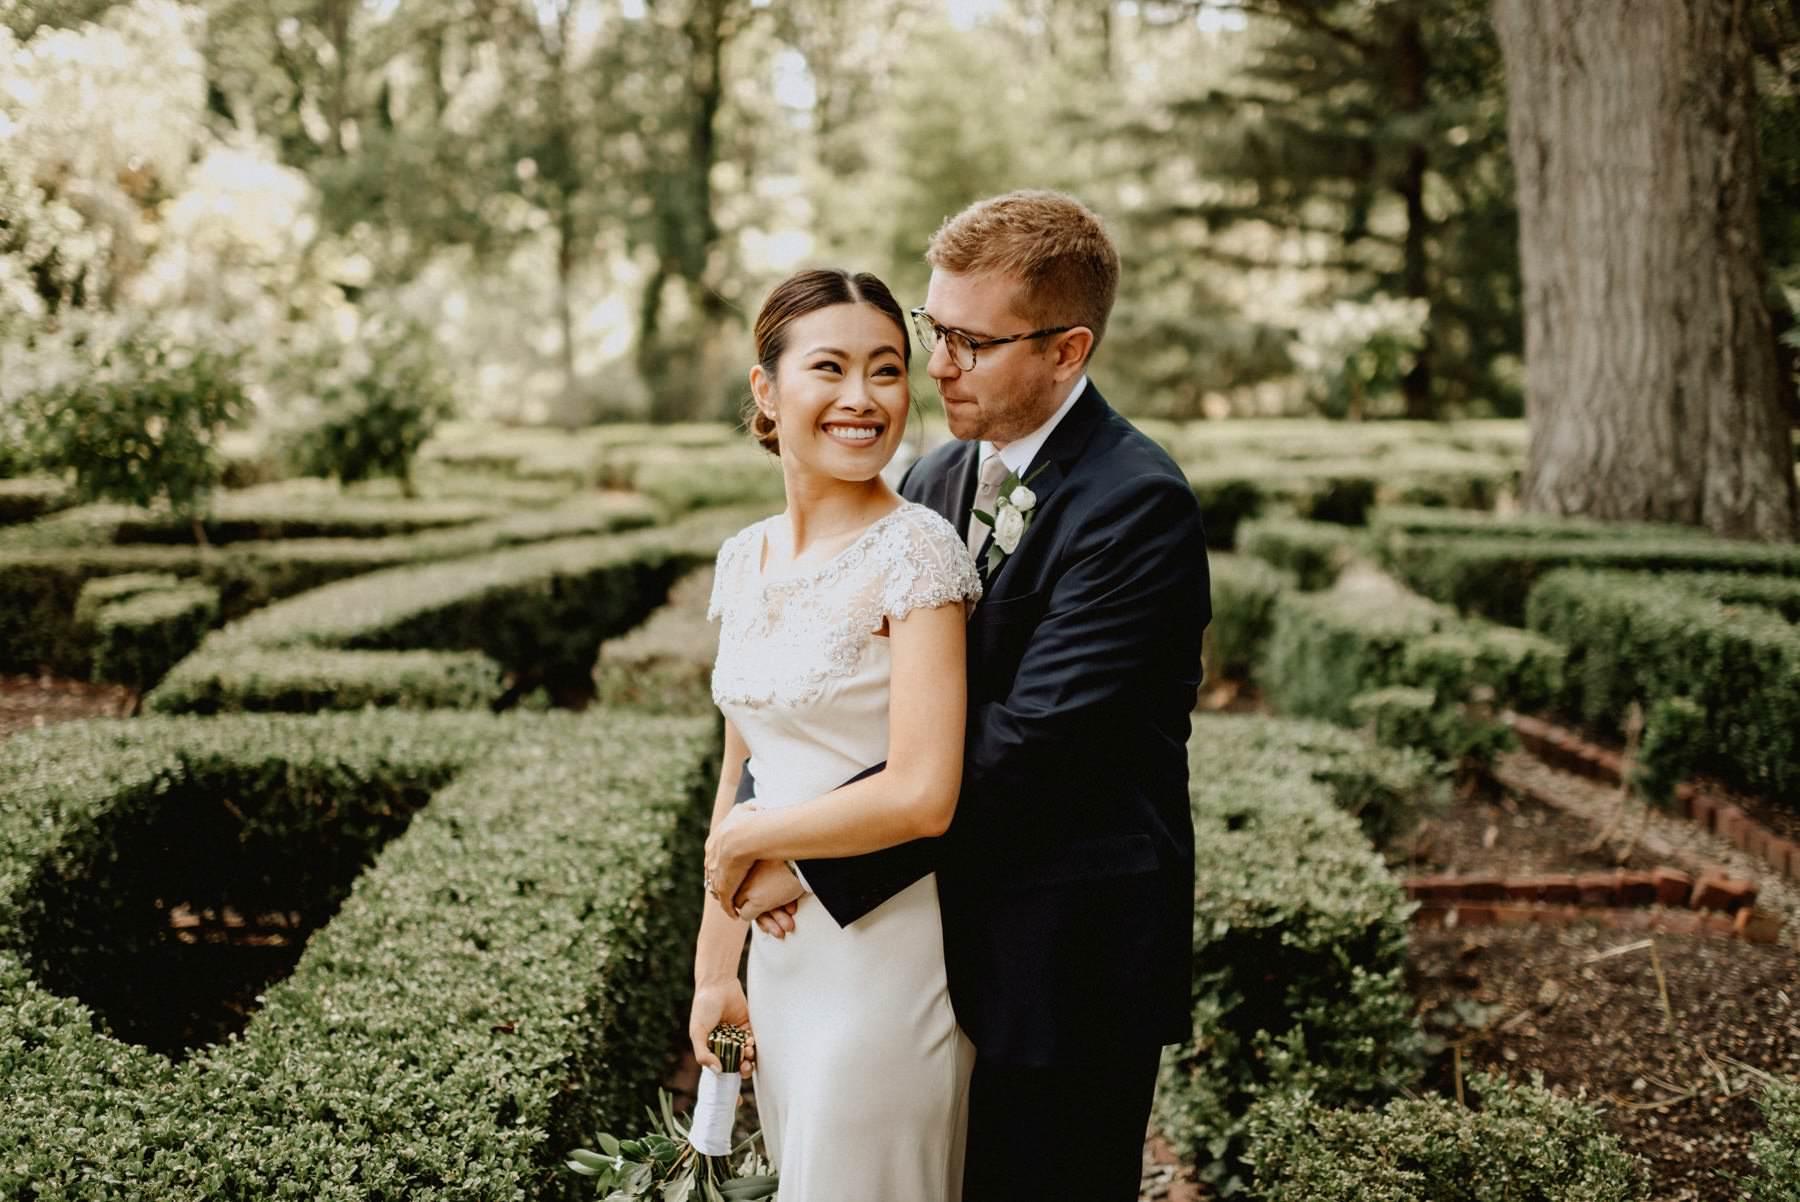 Appleford-estate-wedding-58.jpg